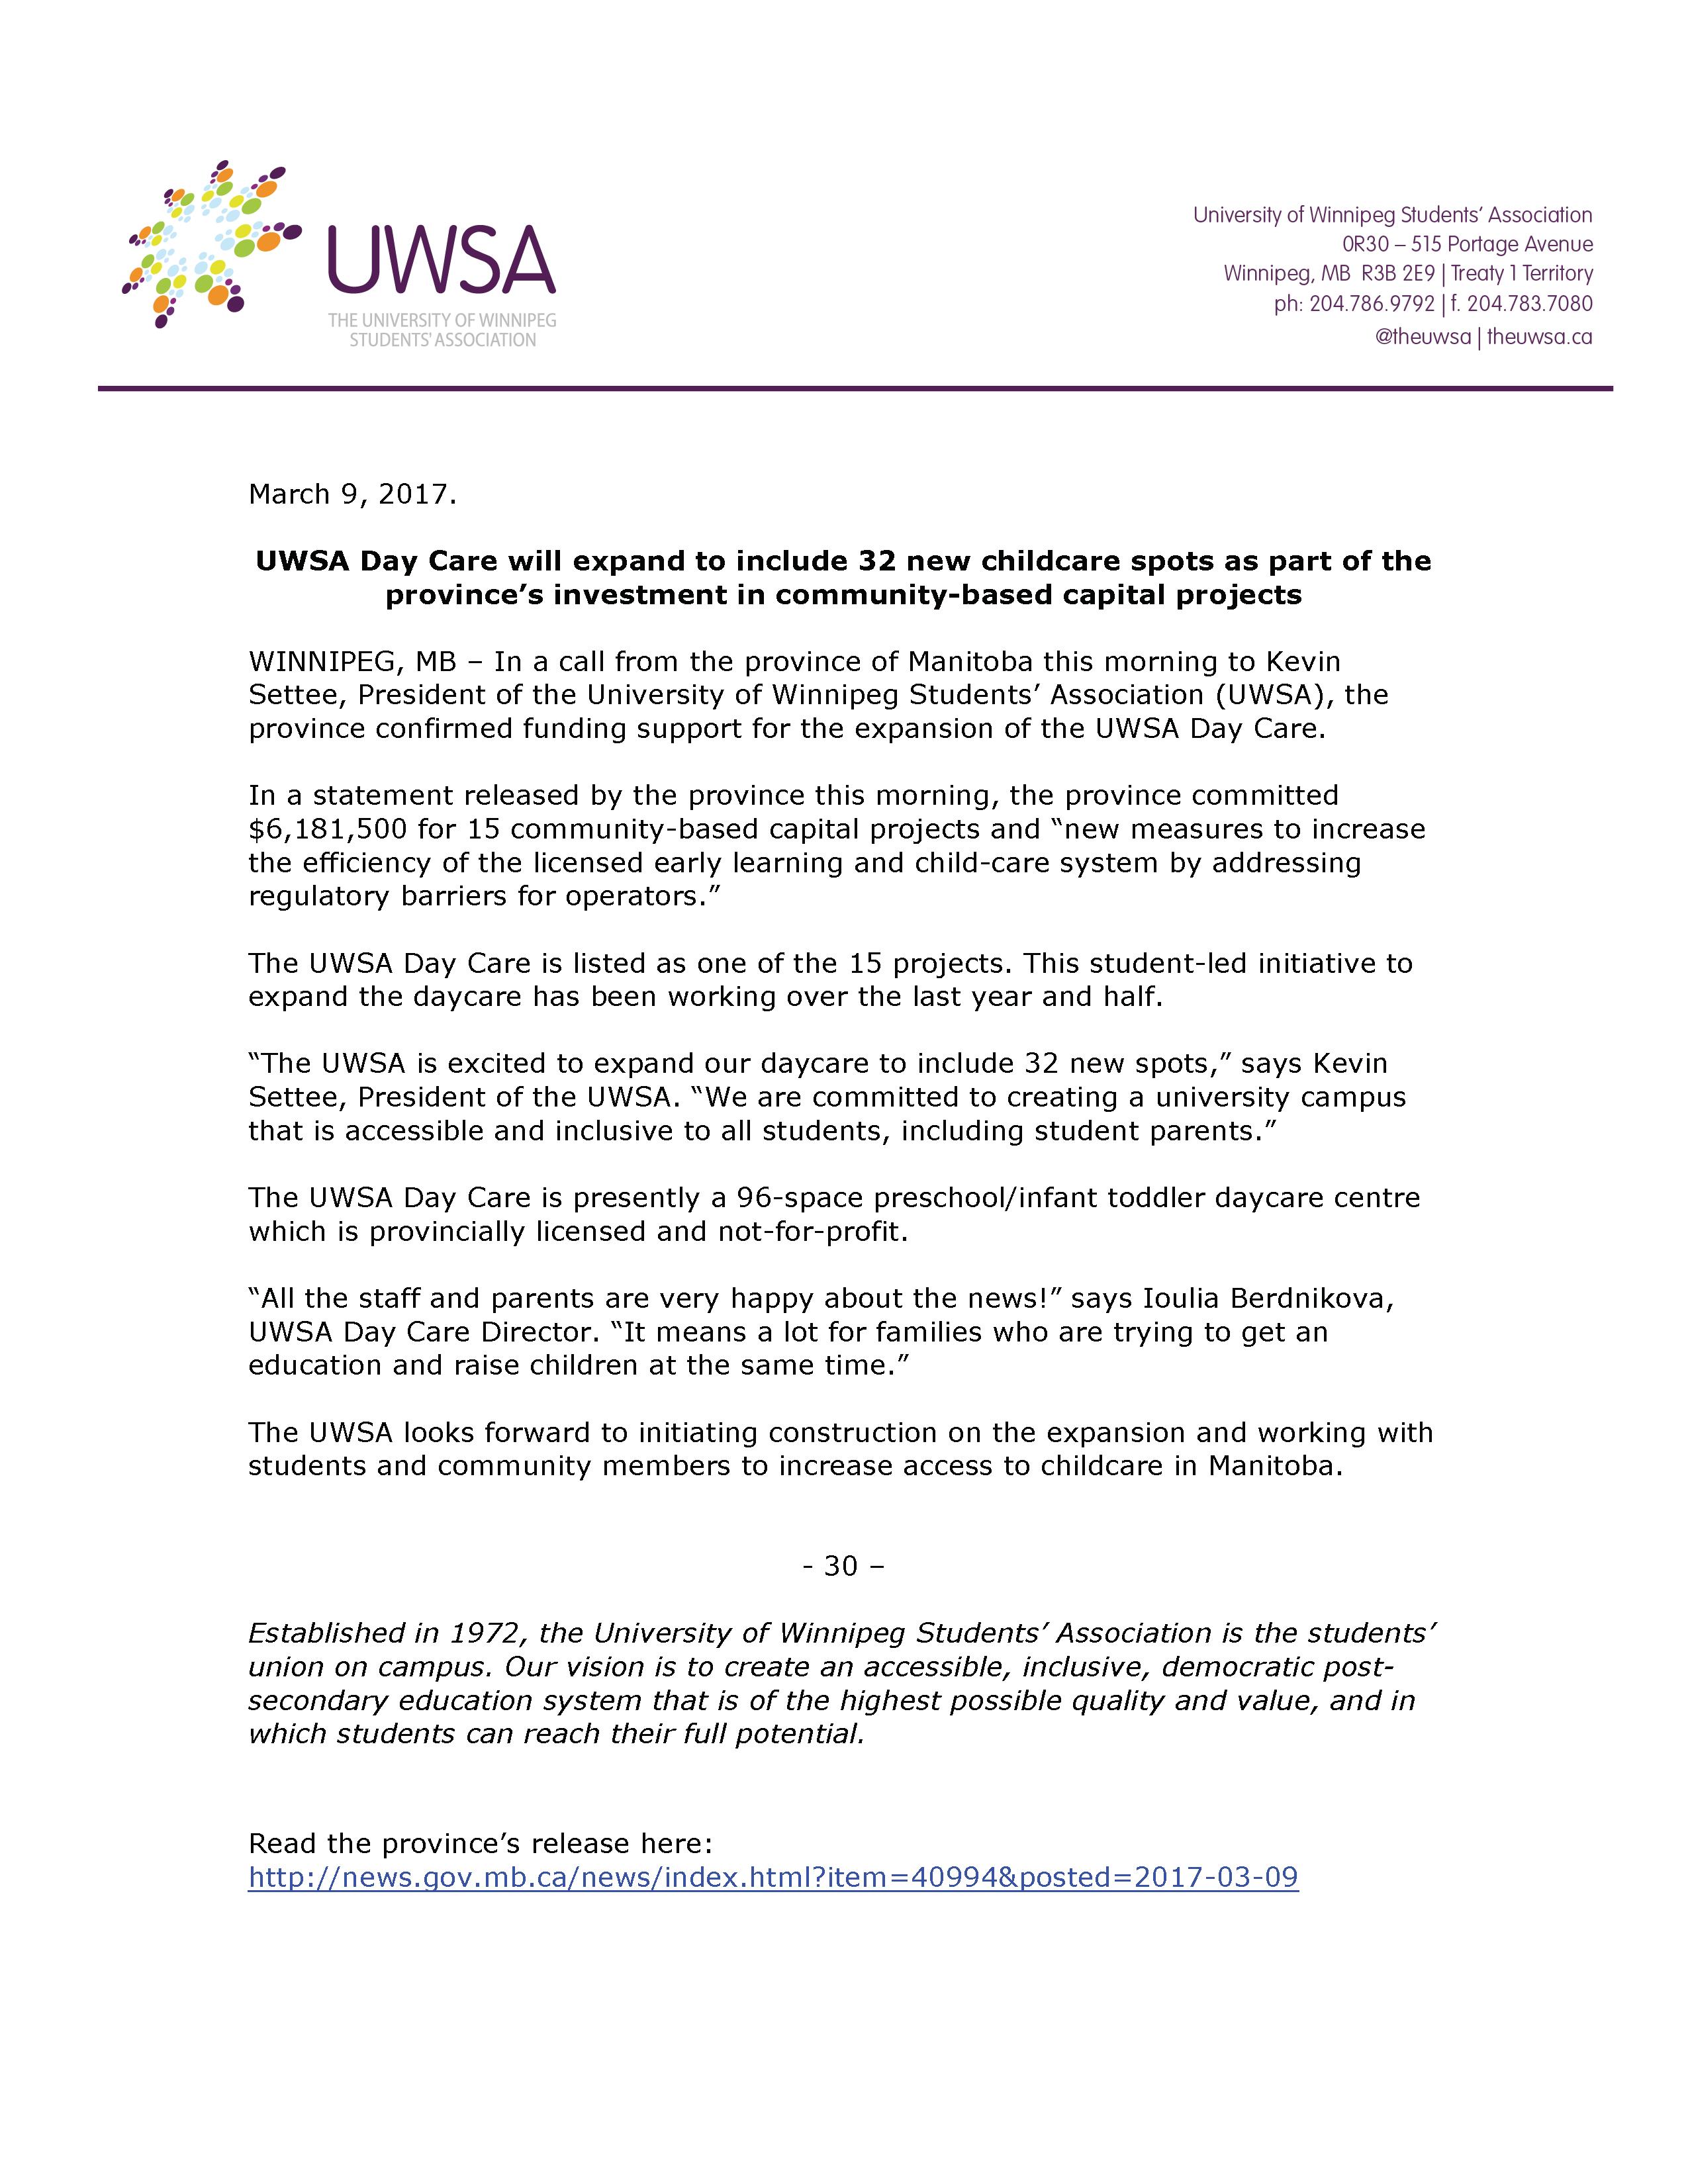 UWSA Daycare - March 9